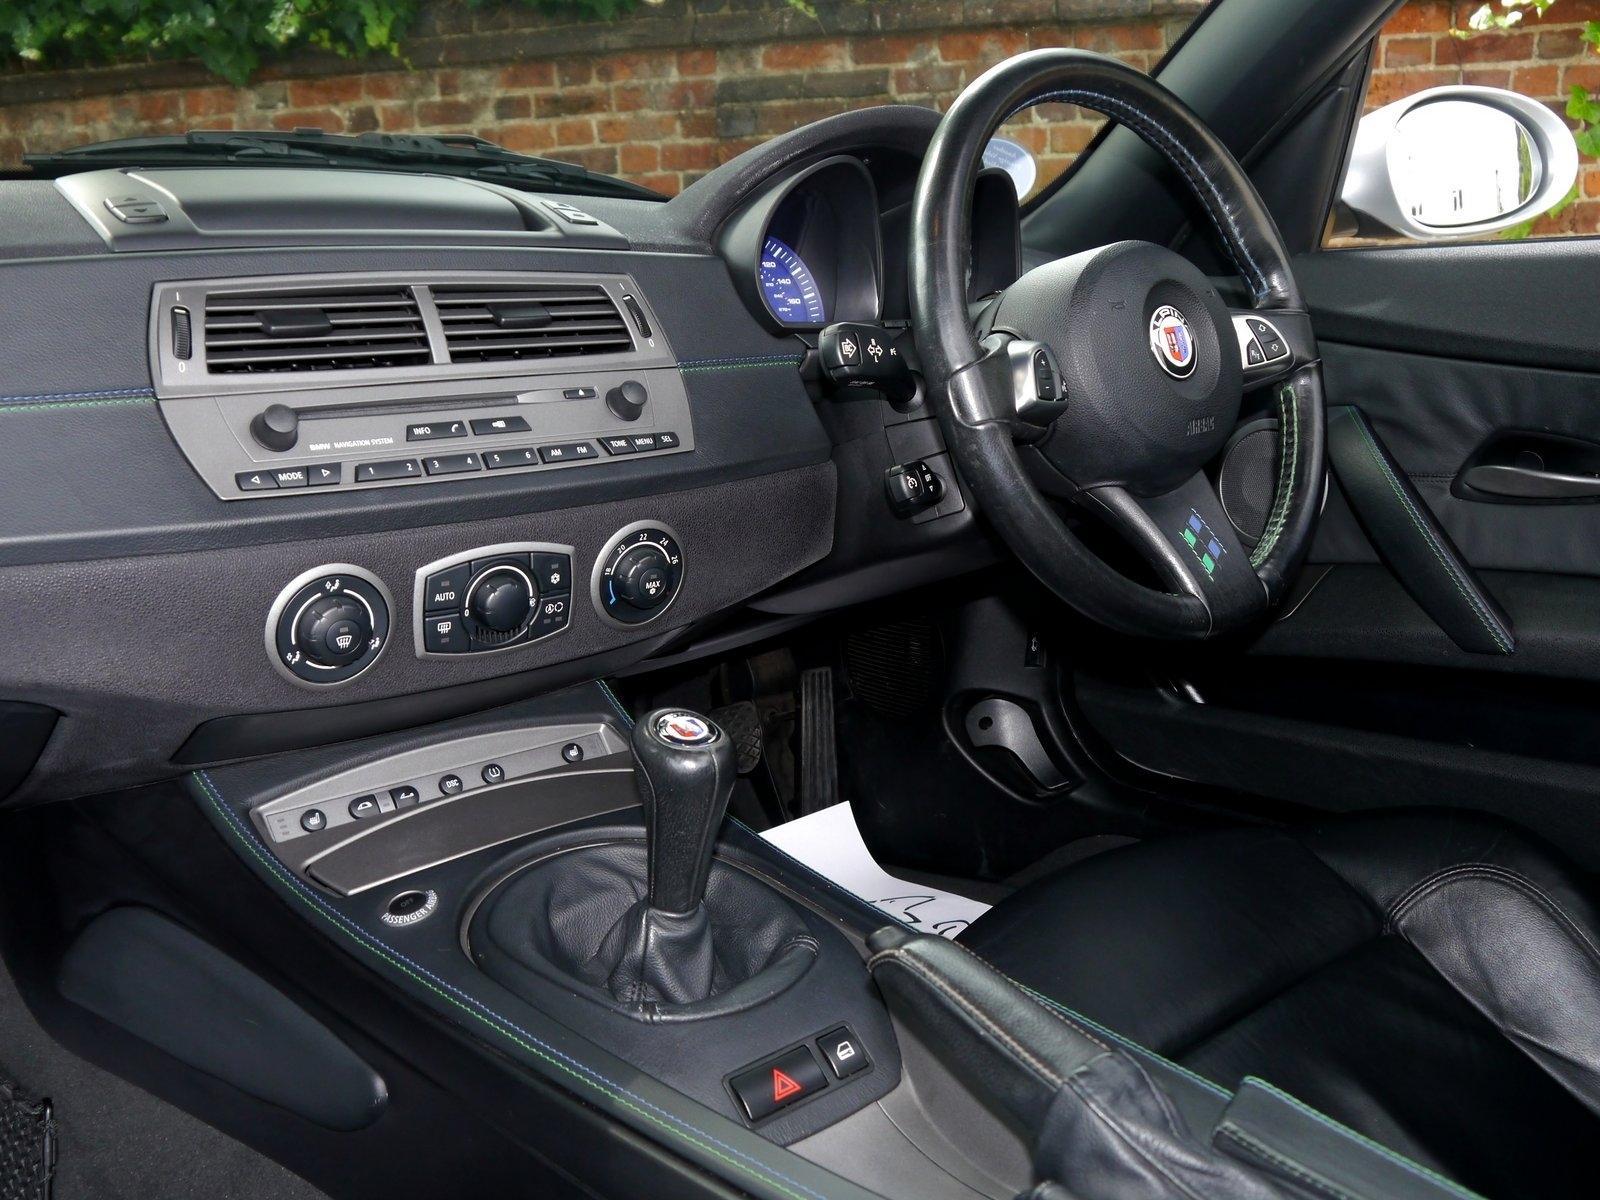 BMWALPINA ROADSTER 3.4 S LUX - RARE VEHICLE - BMW FSH #7